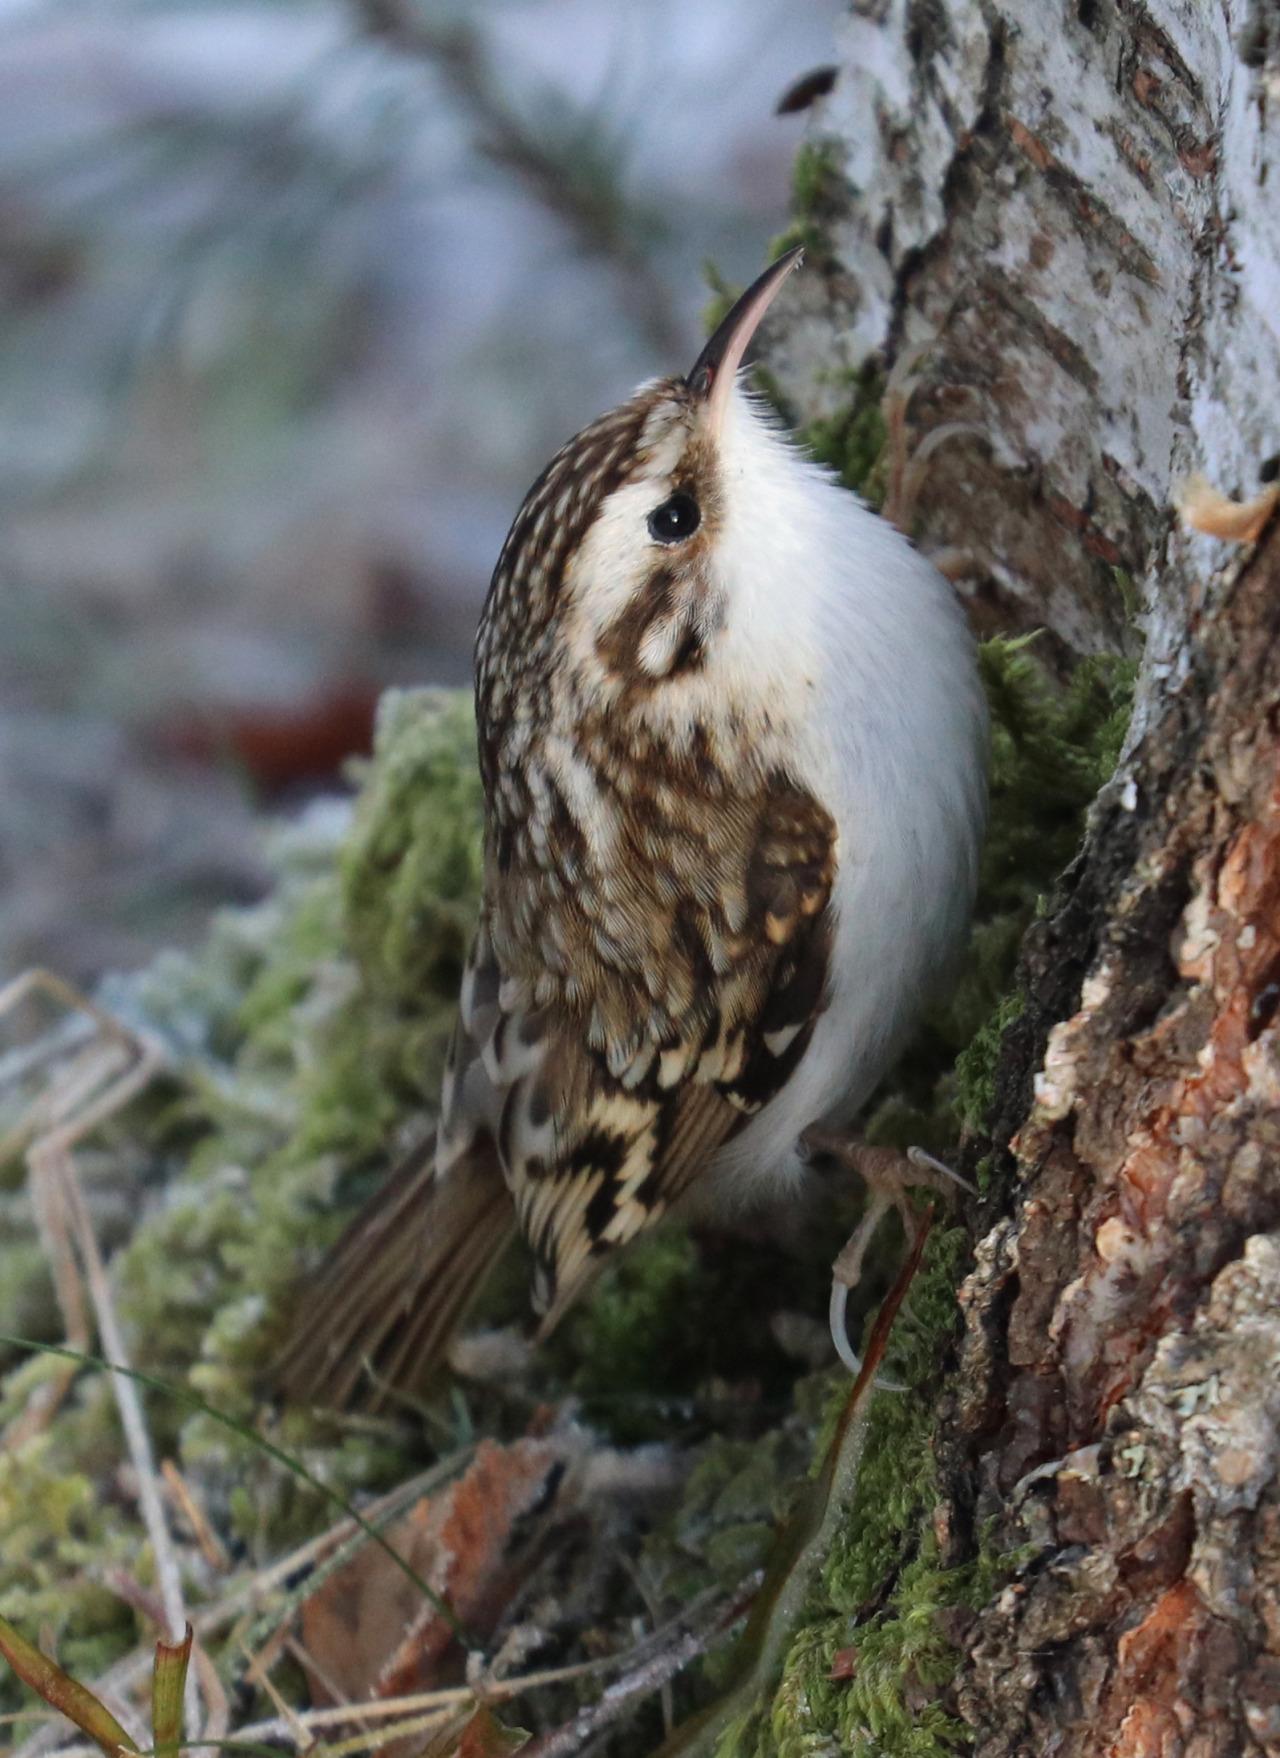 A Grumpy Bird